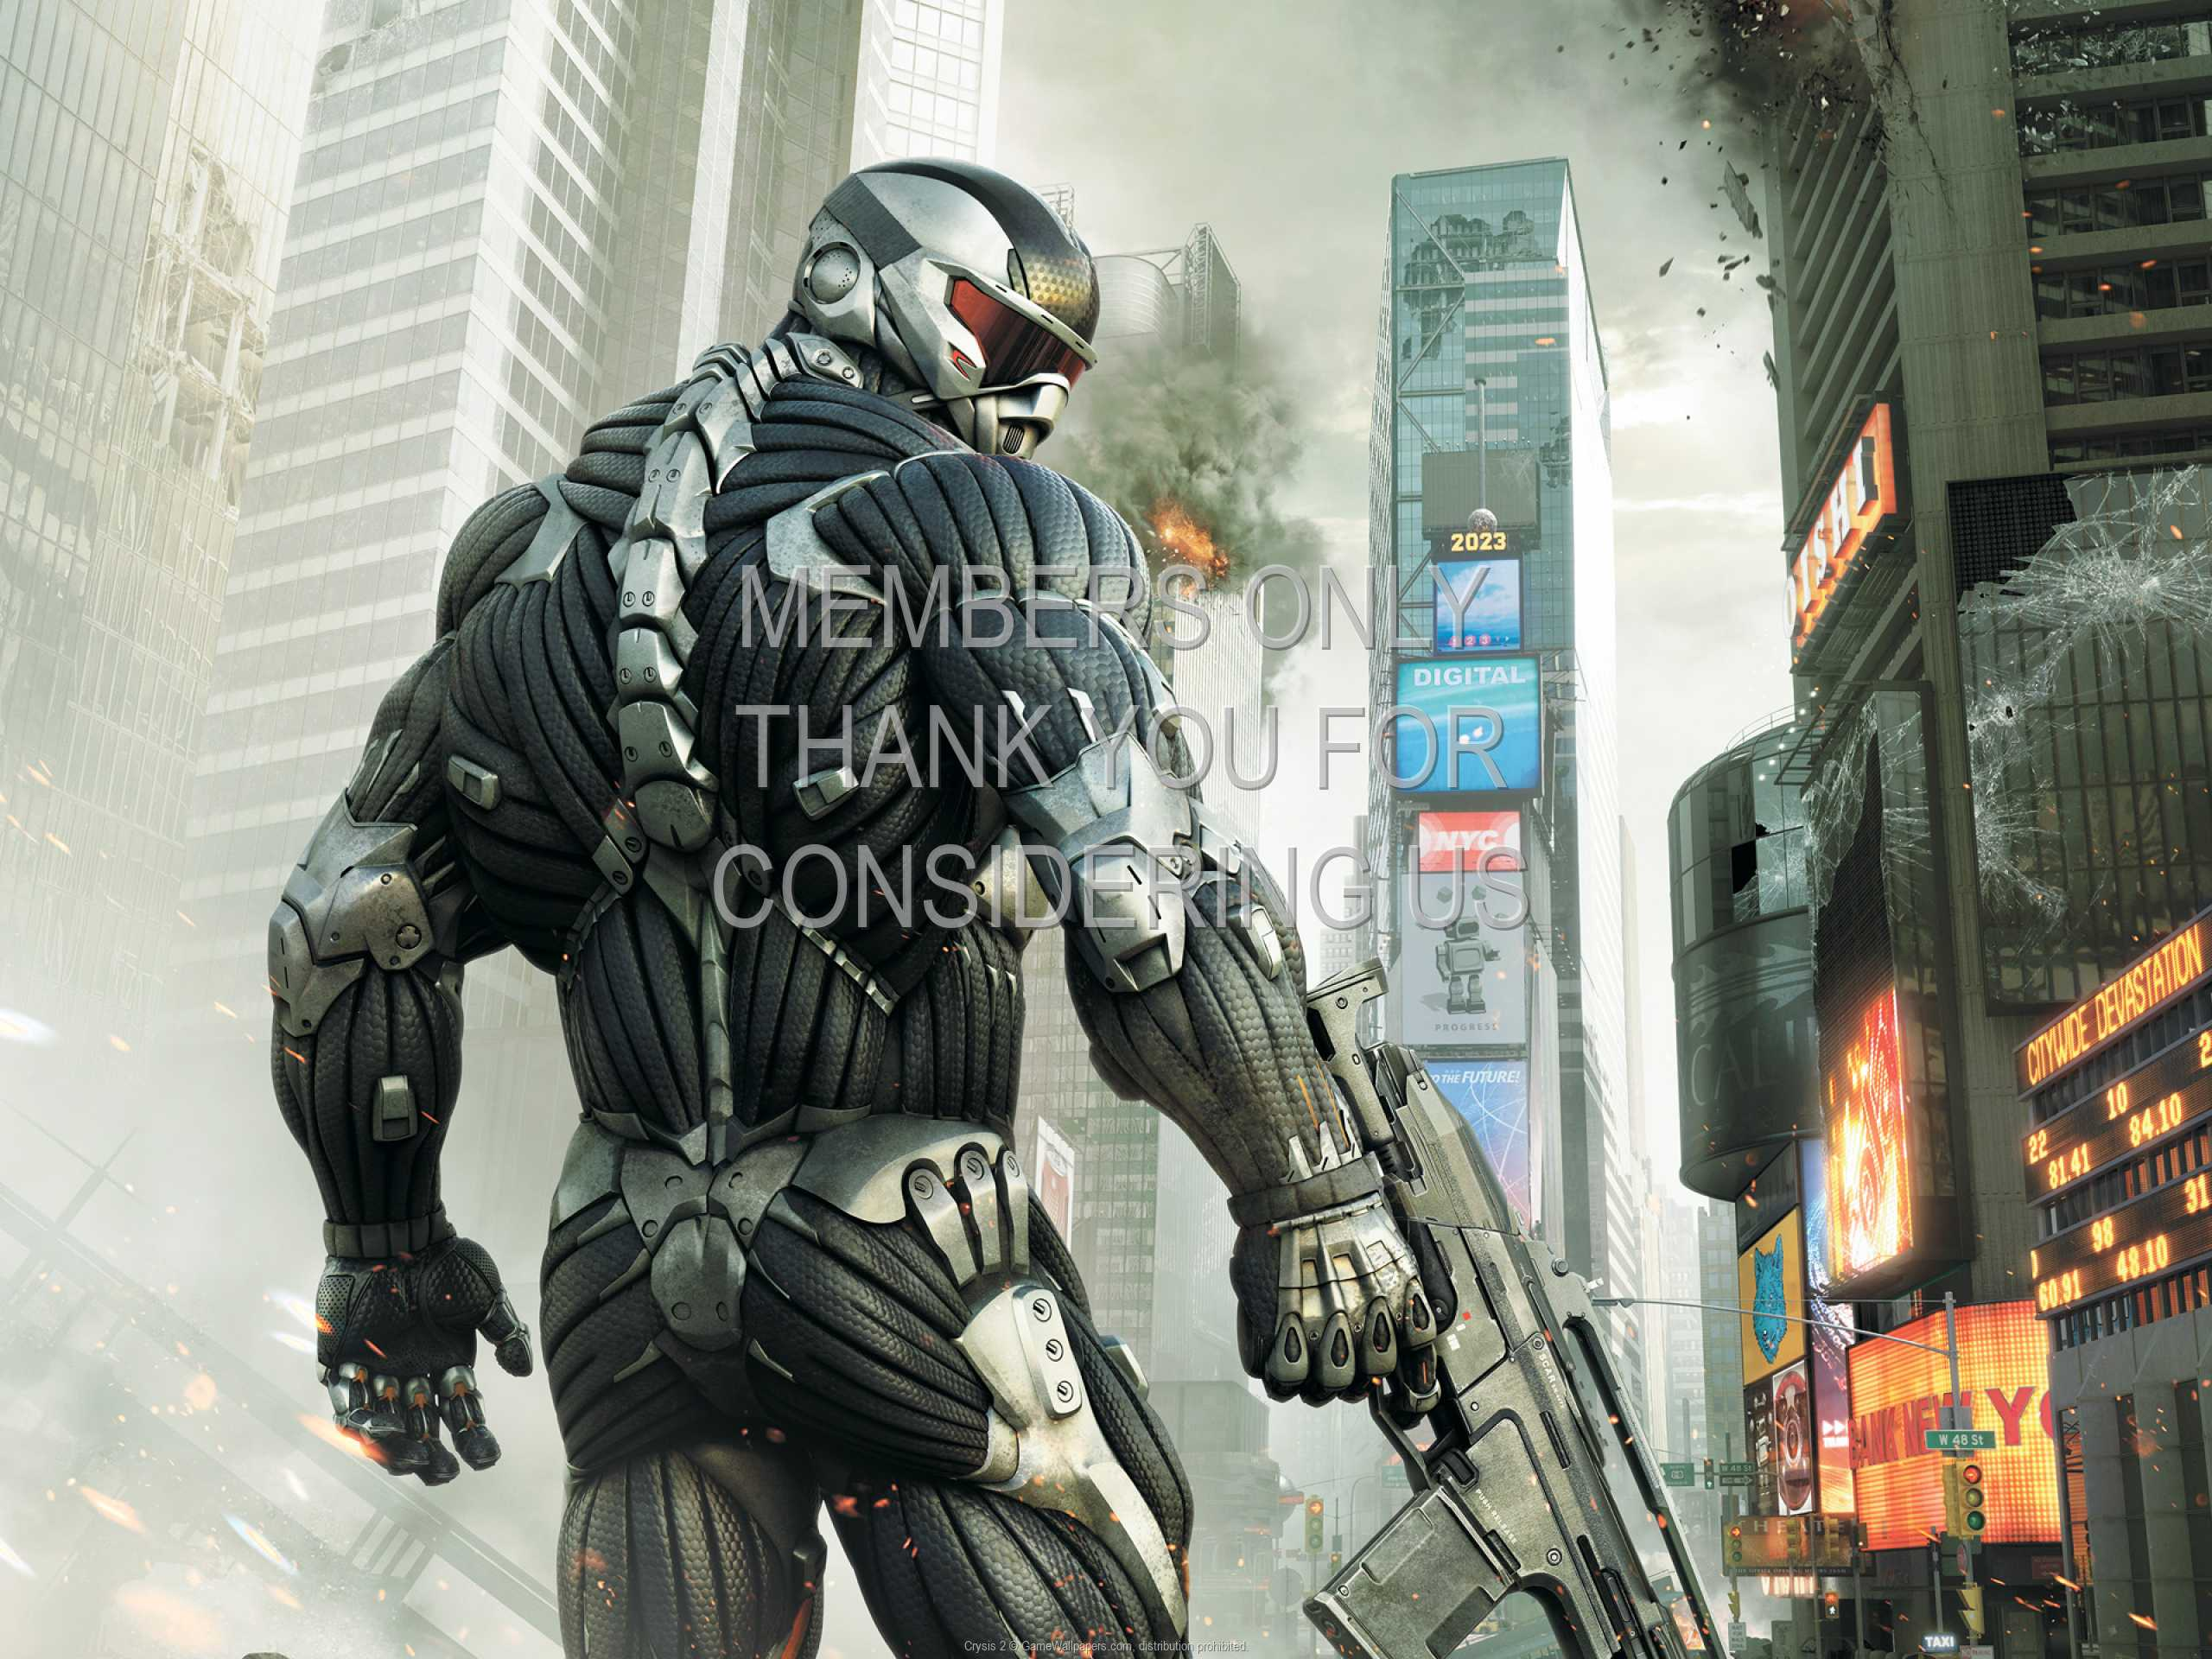 Crysis 2 1080p Horizontal Mobile wallpaper or background 09